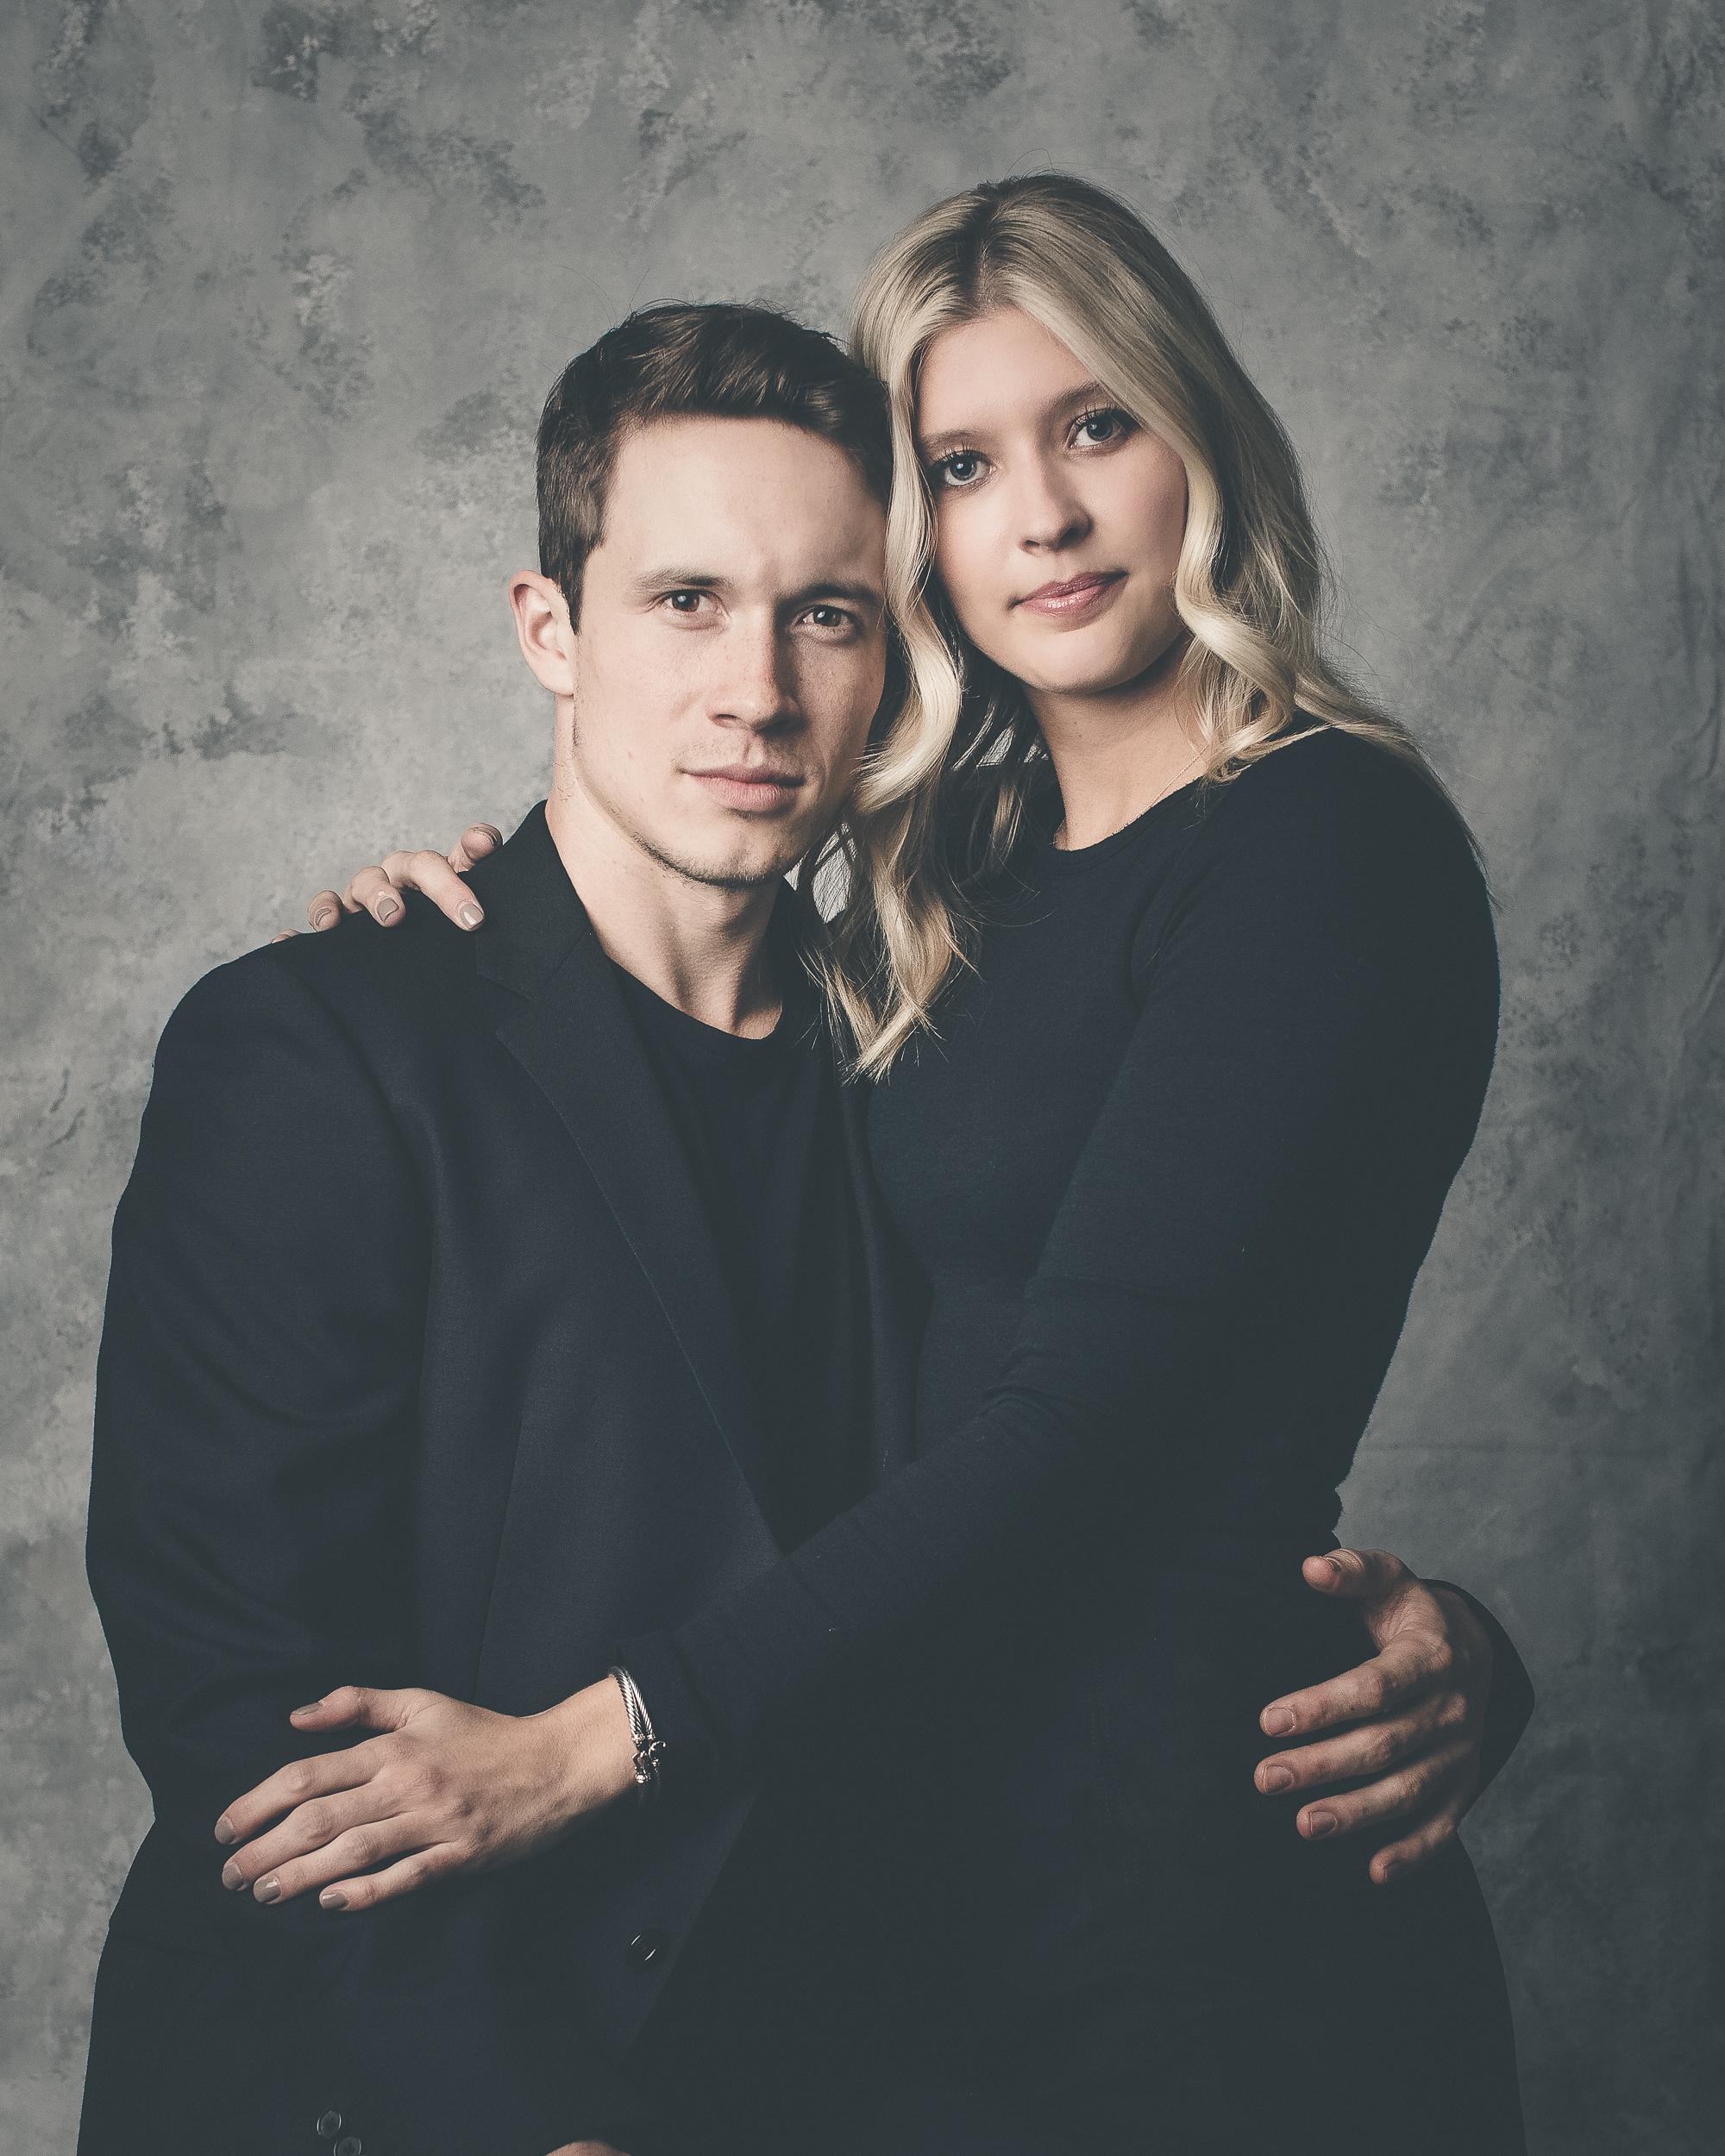 couple-studio-portrait.jpg